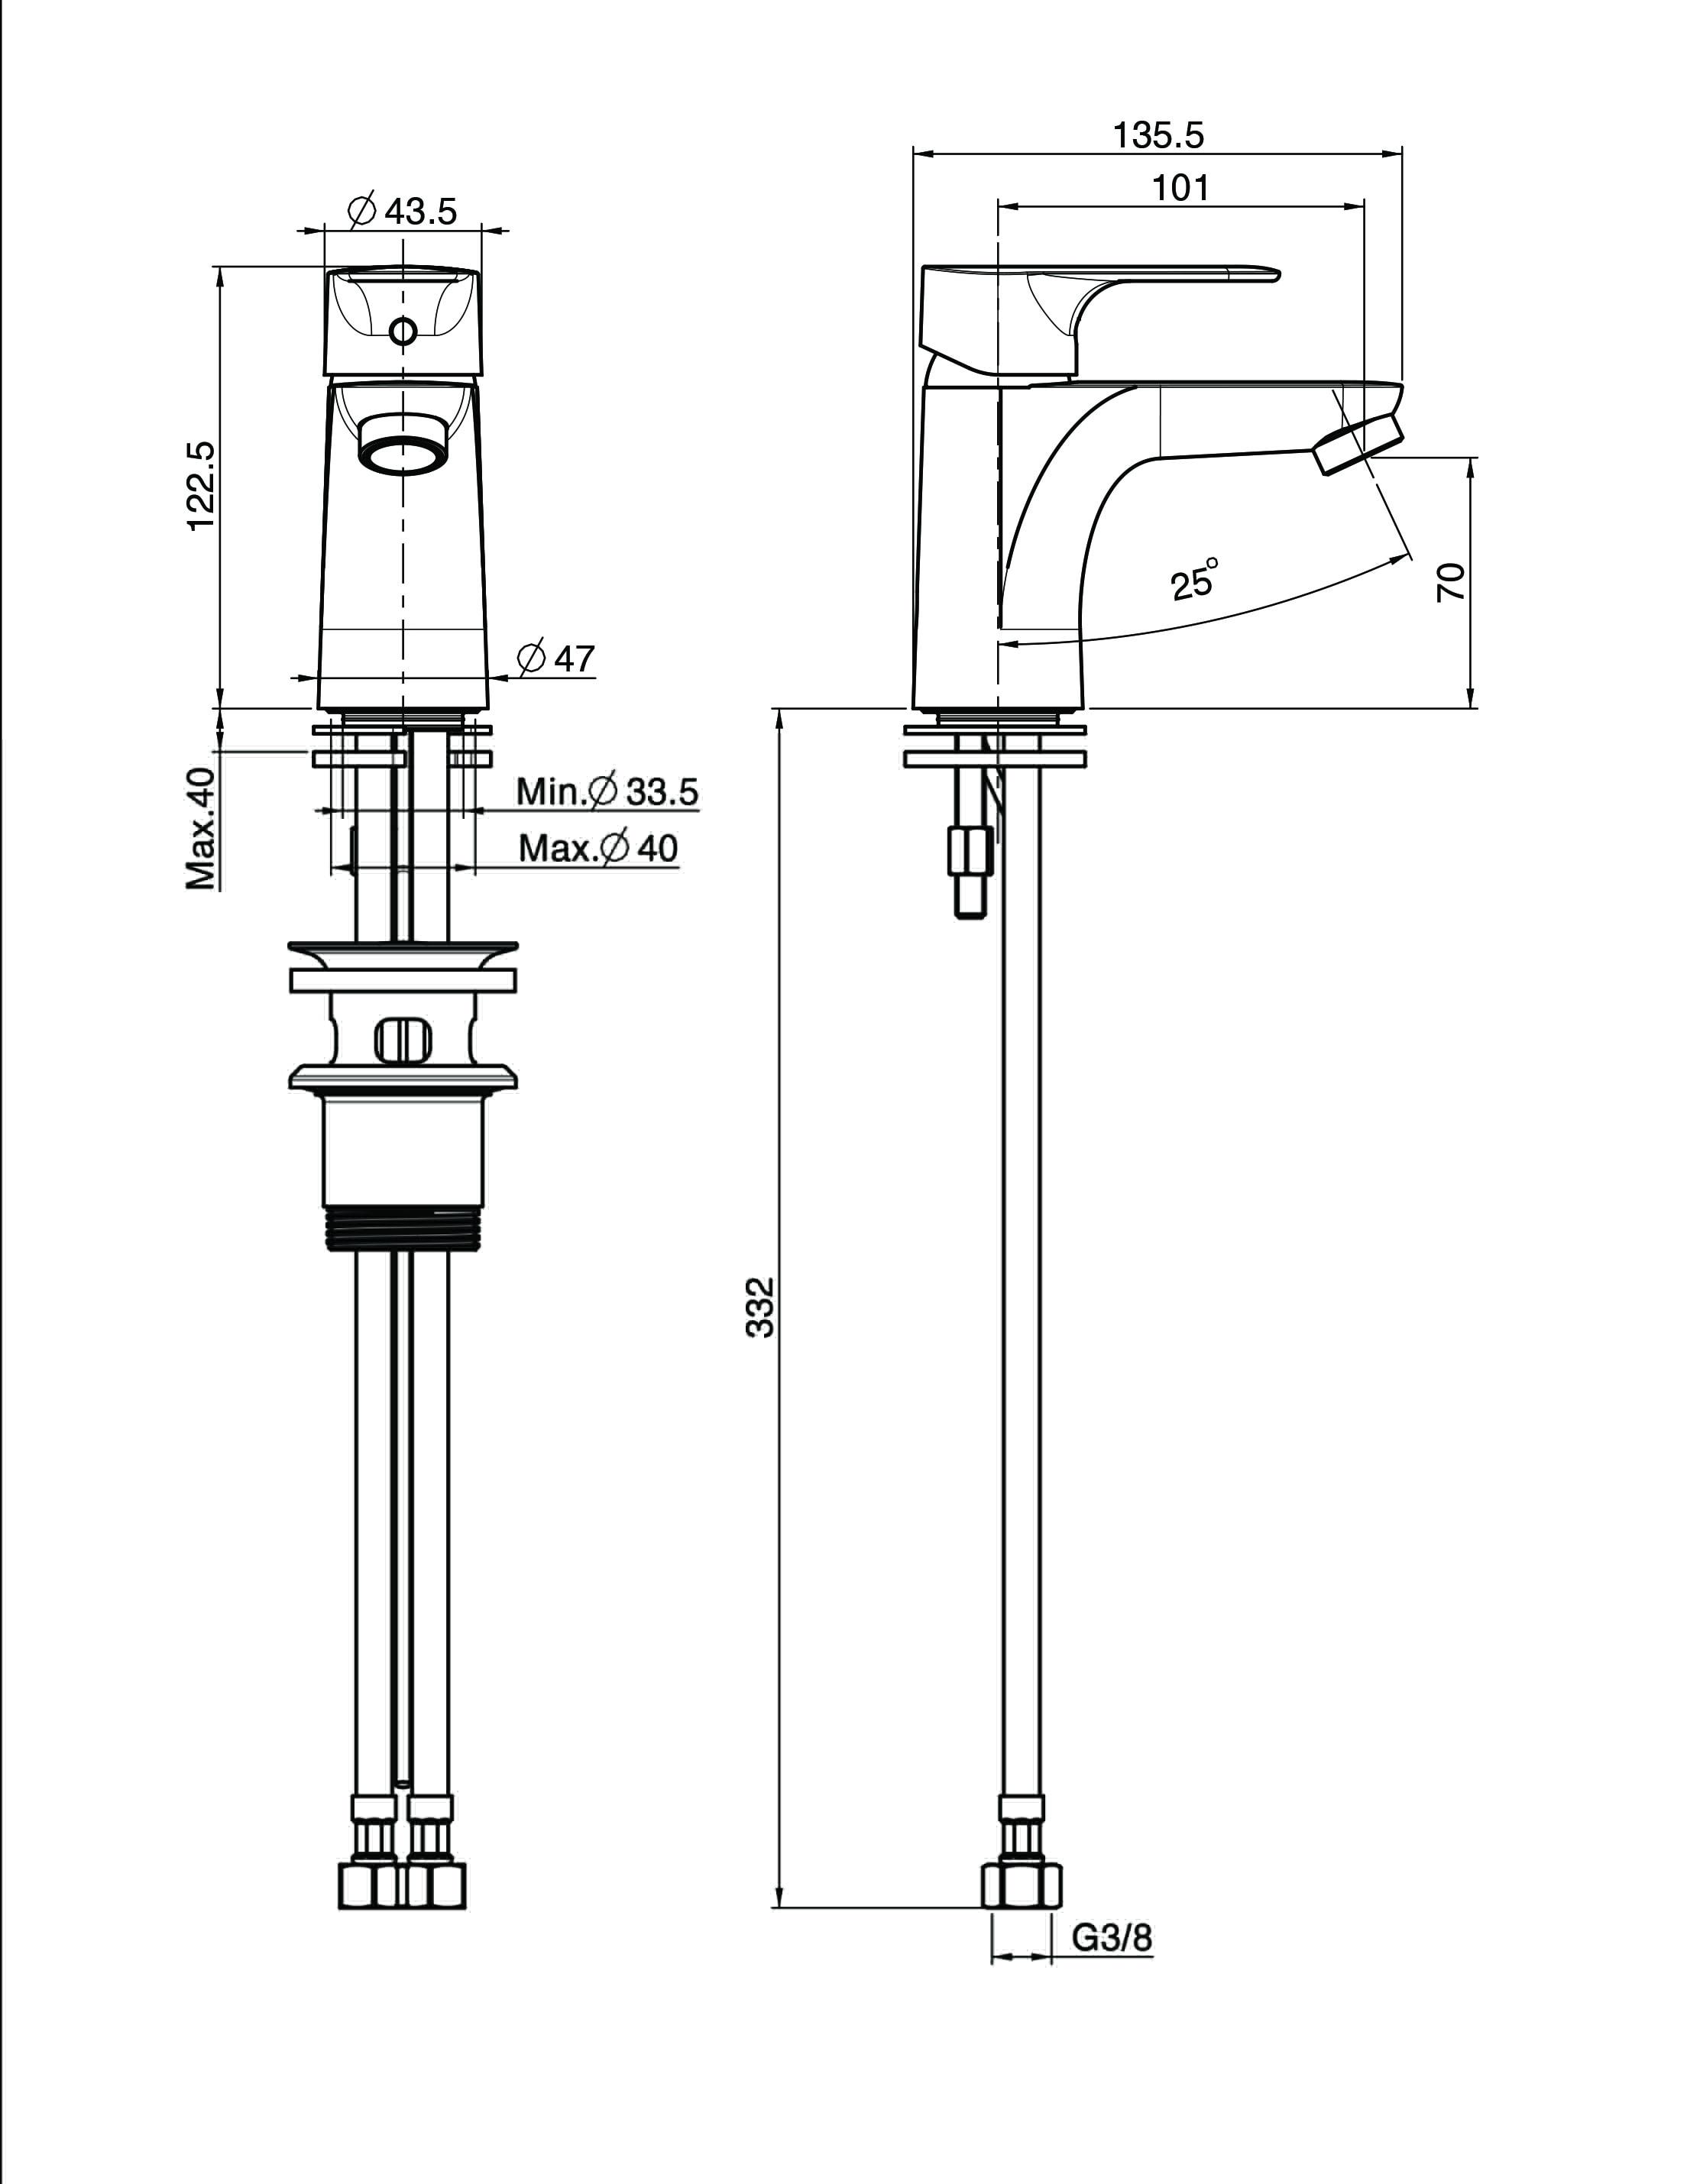 Fima Series22 Basinmix 123 F3831 Technical Drawing